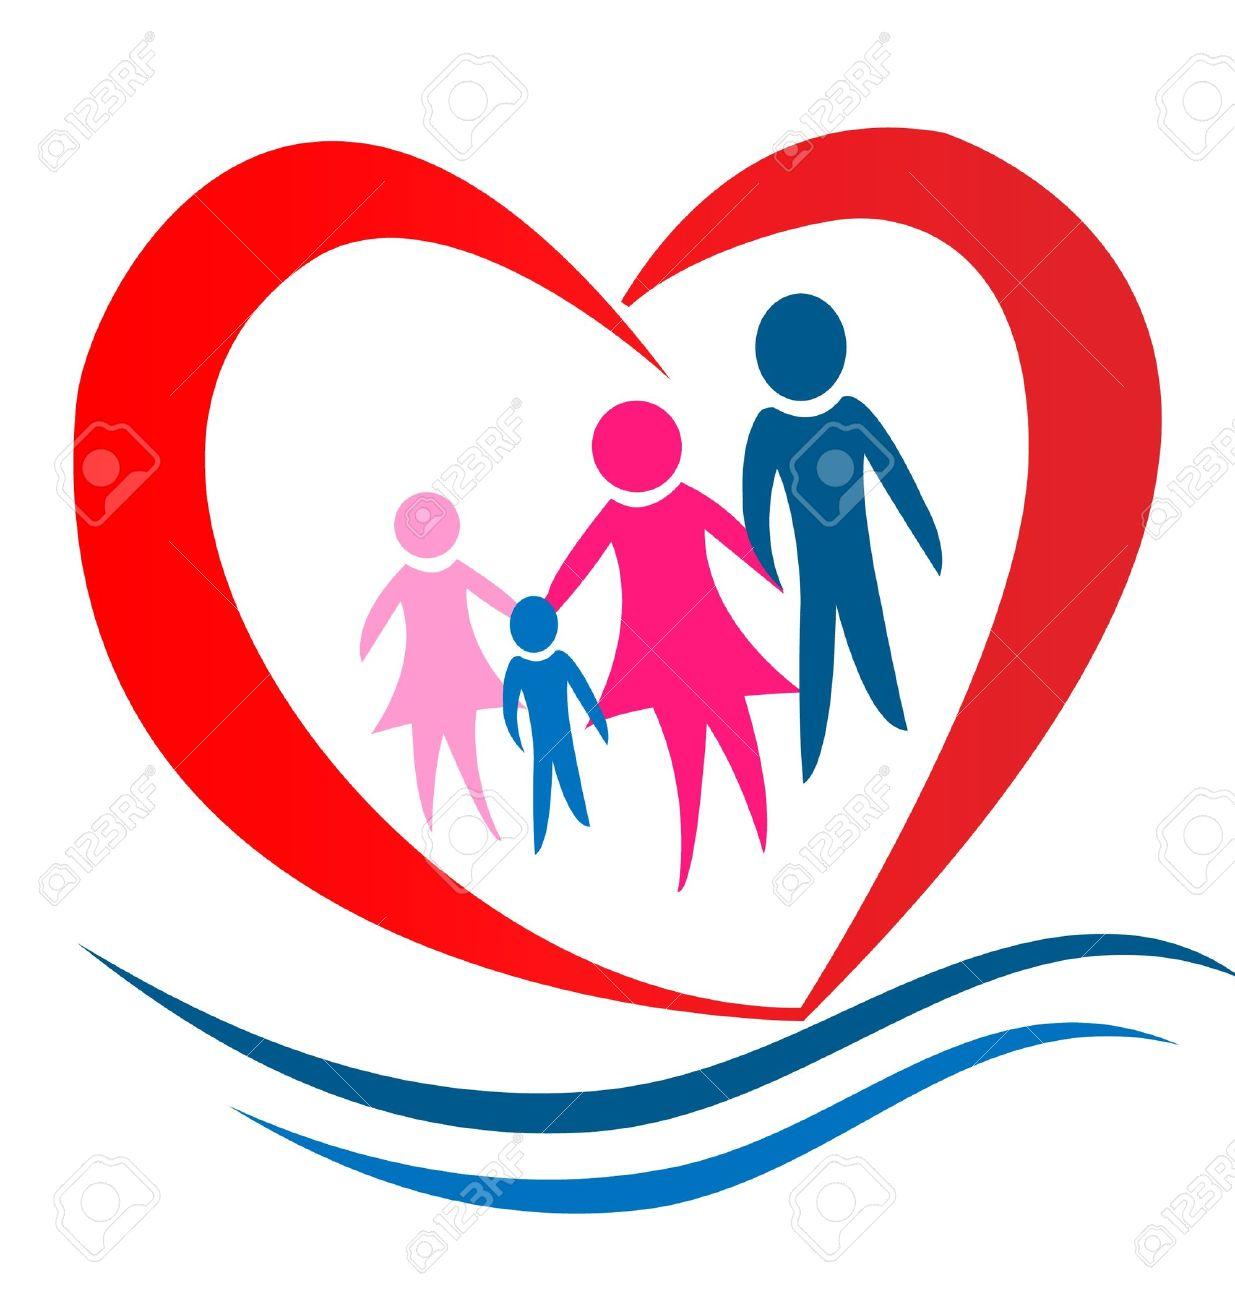 Family heart logo Stock Vector - 13975518